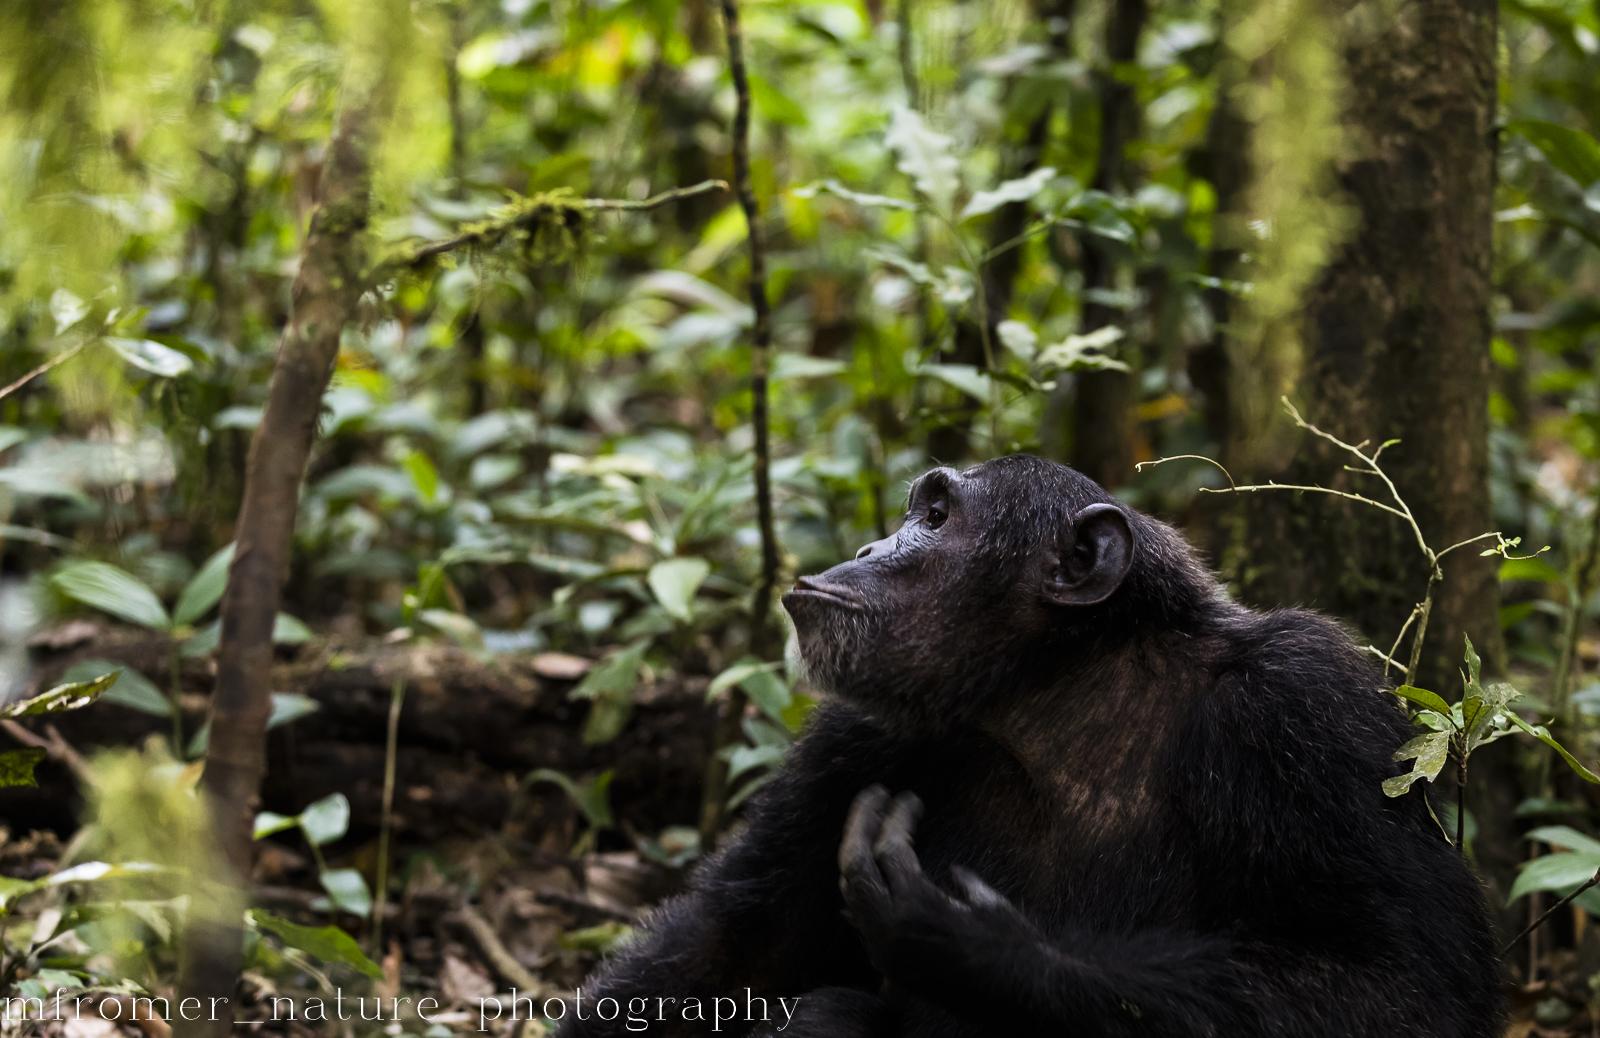 Dominant male, Chimpanzee